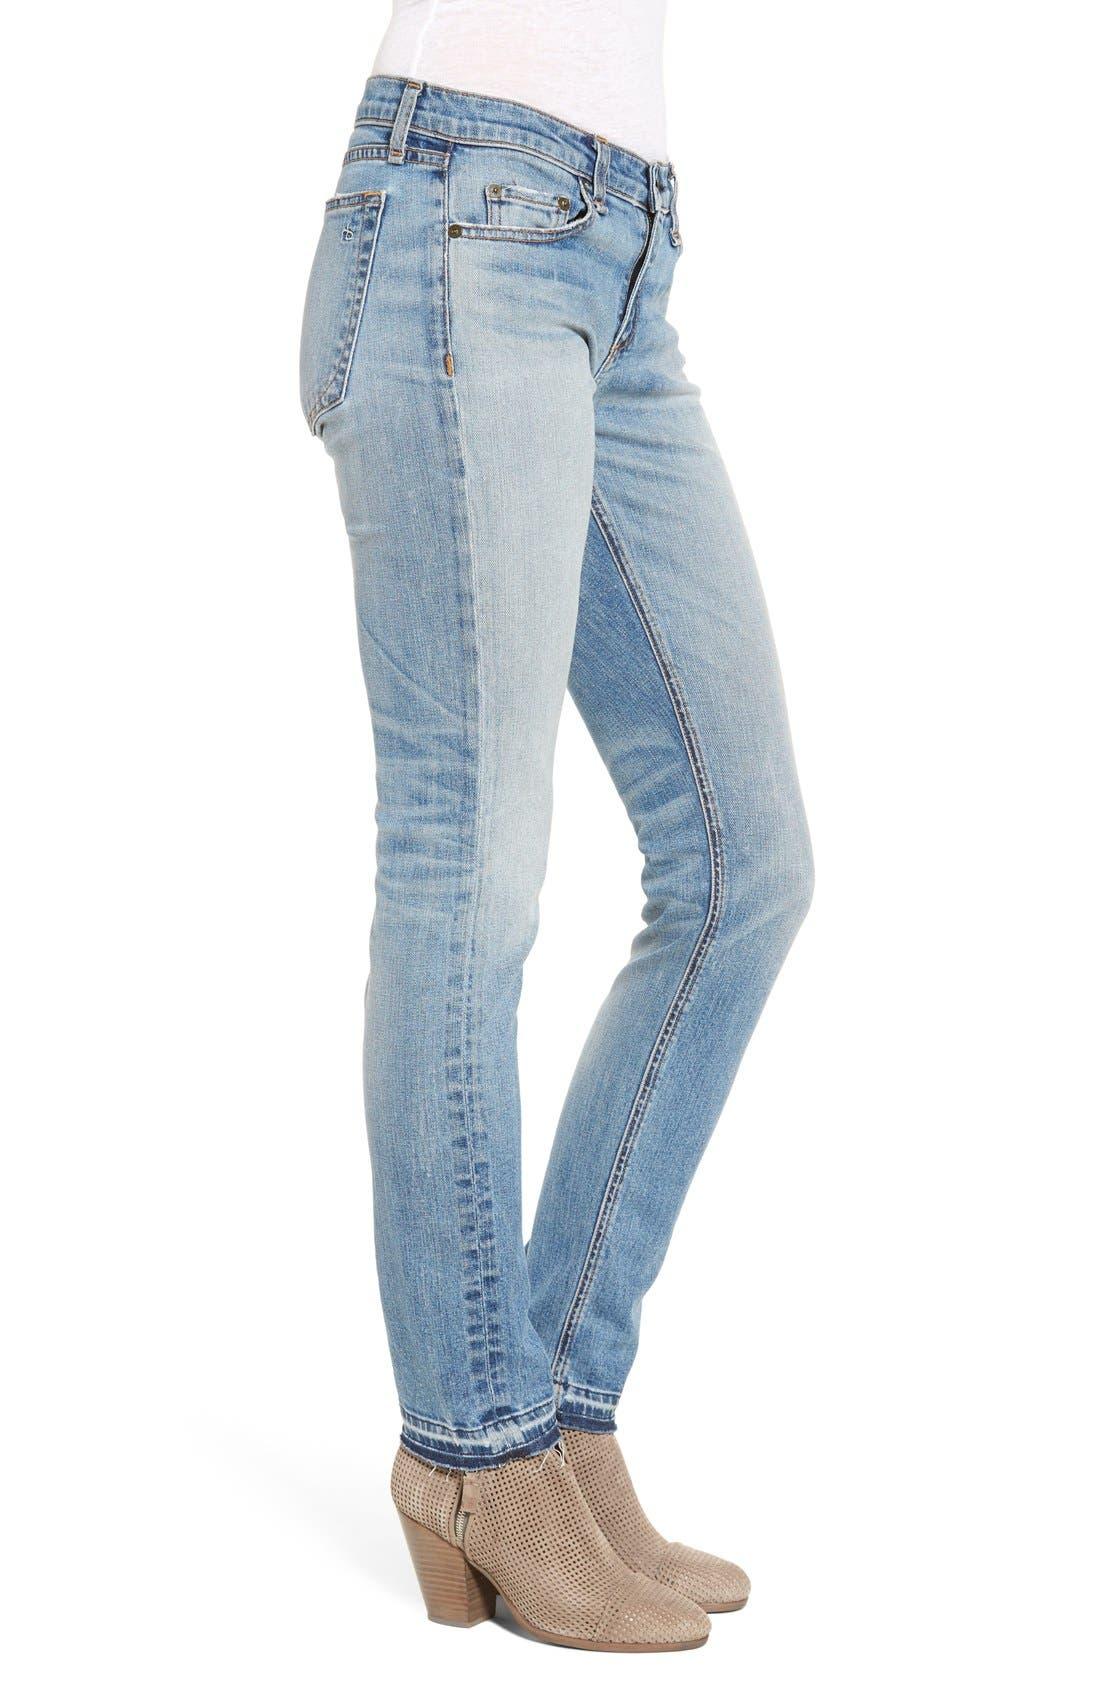 Alternate Image 3  - rag & bone/JEAN 'The Dre' Slim Boyfriend Jeans